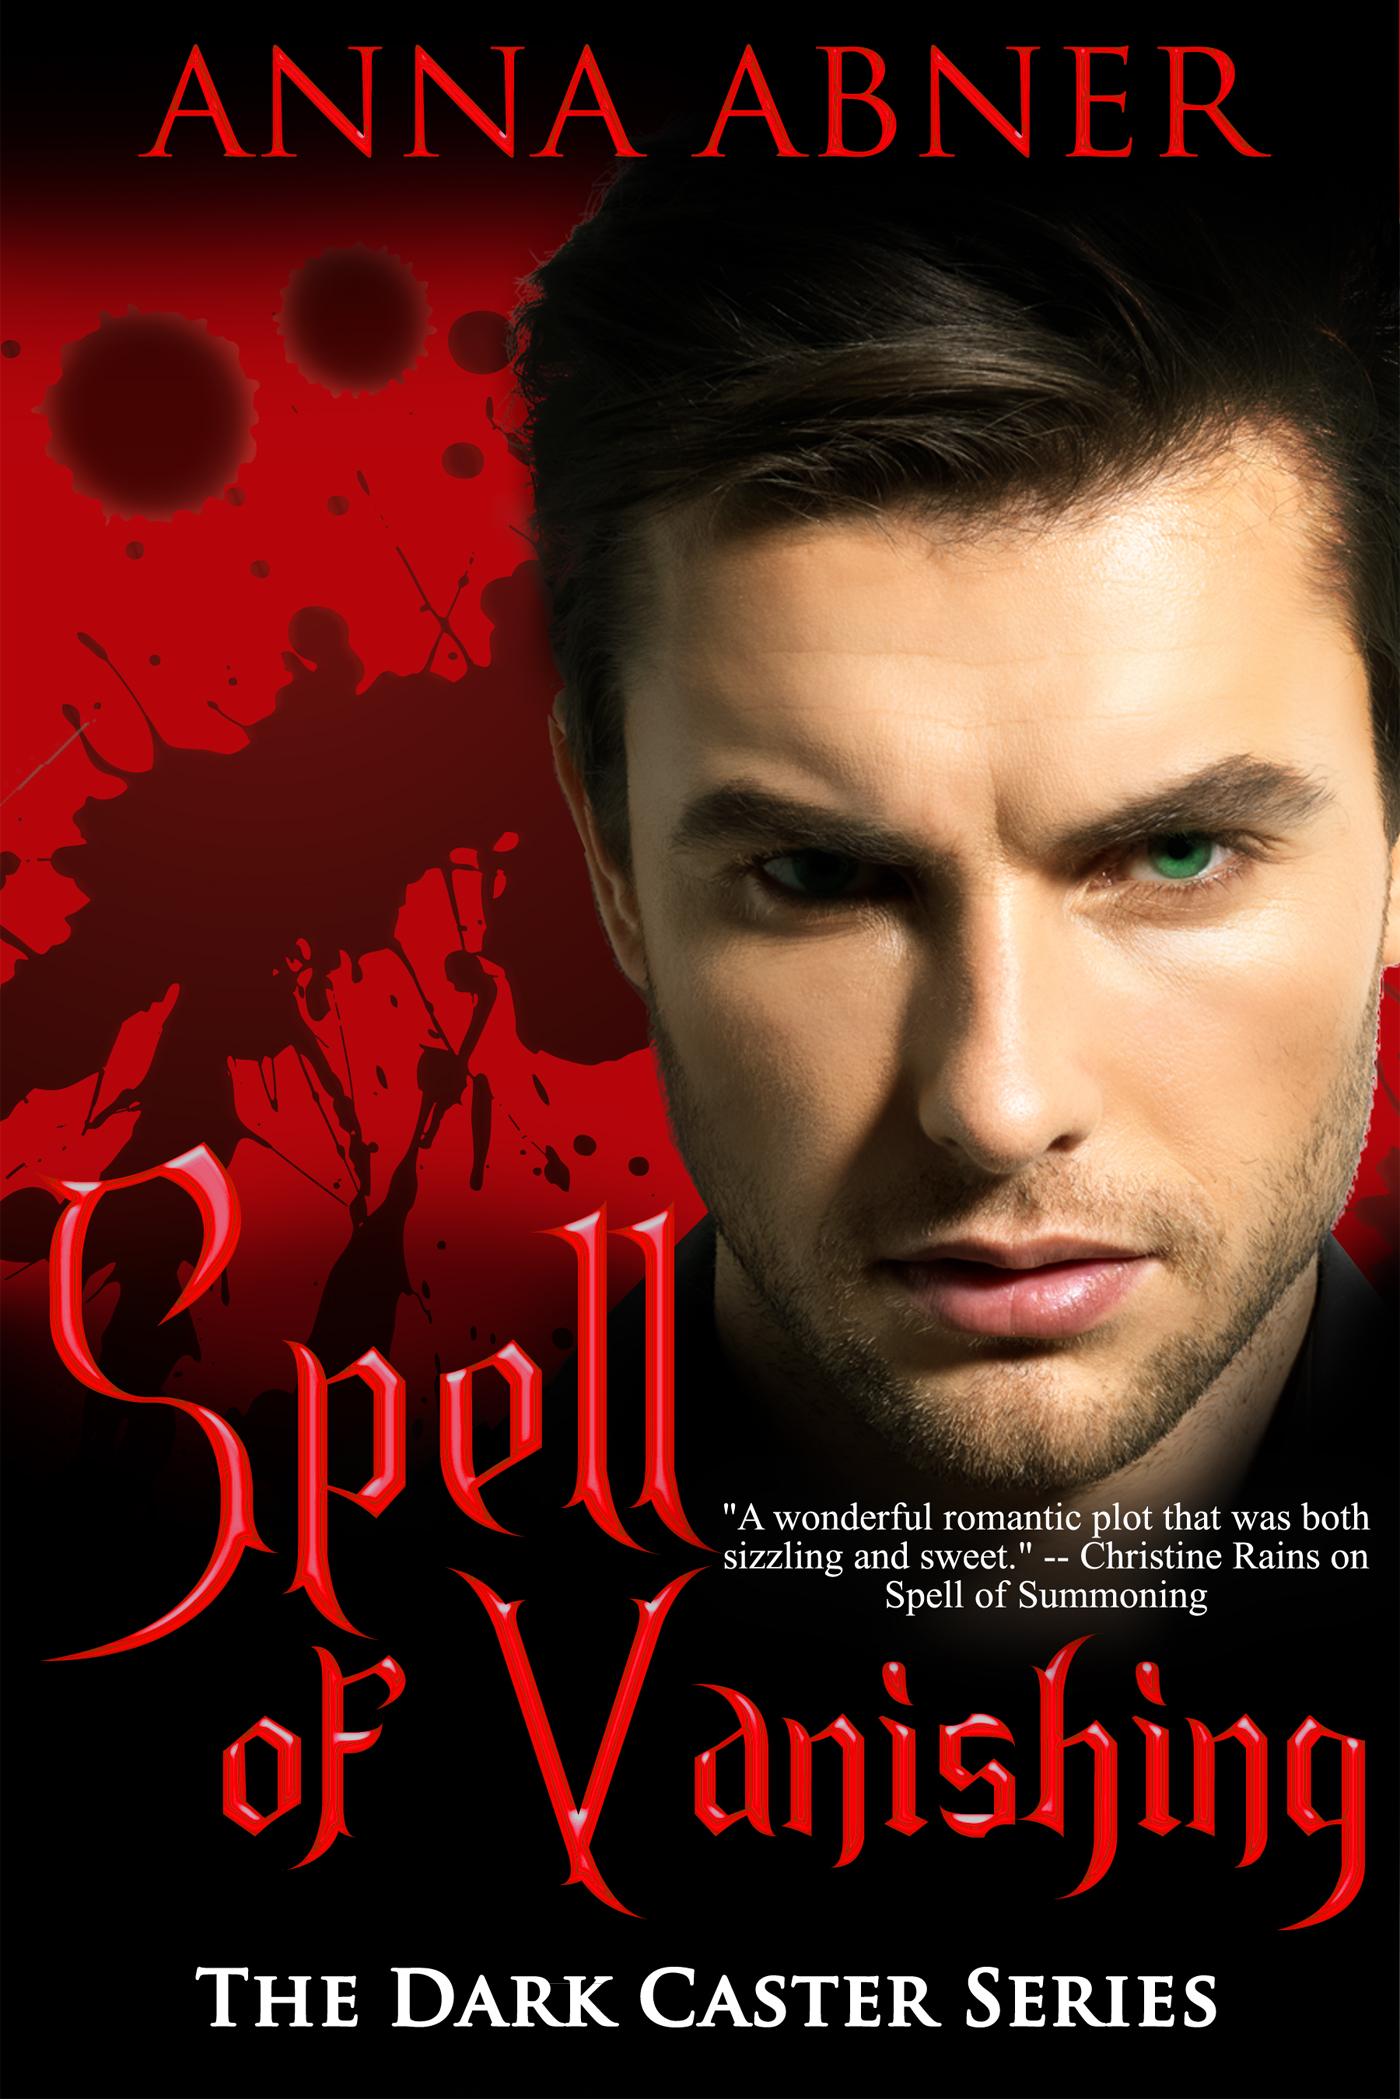 Spell of Vanishing (Dark Caster #3)